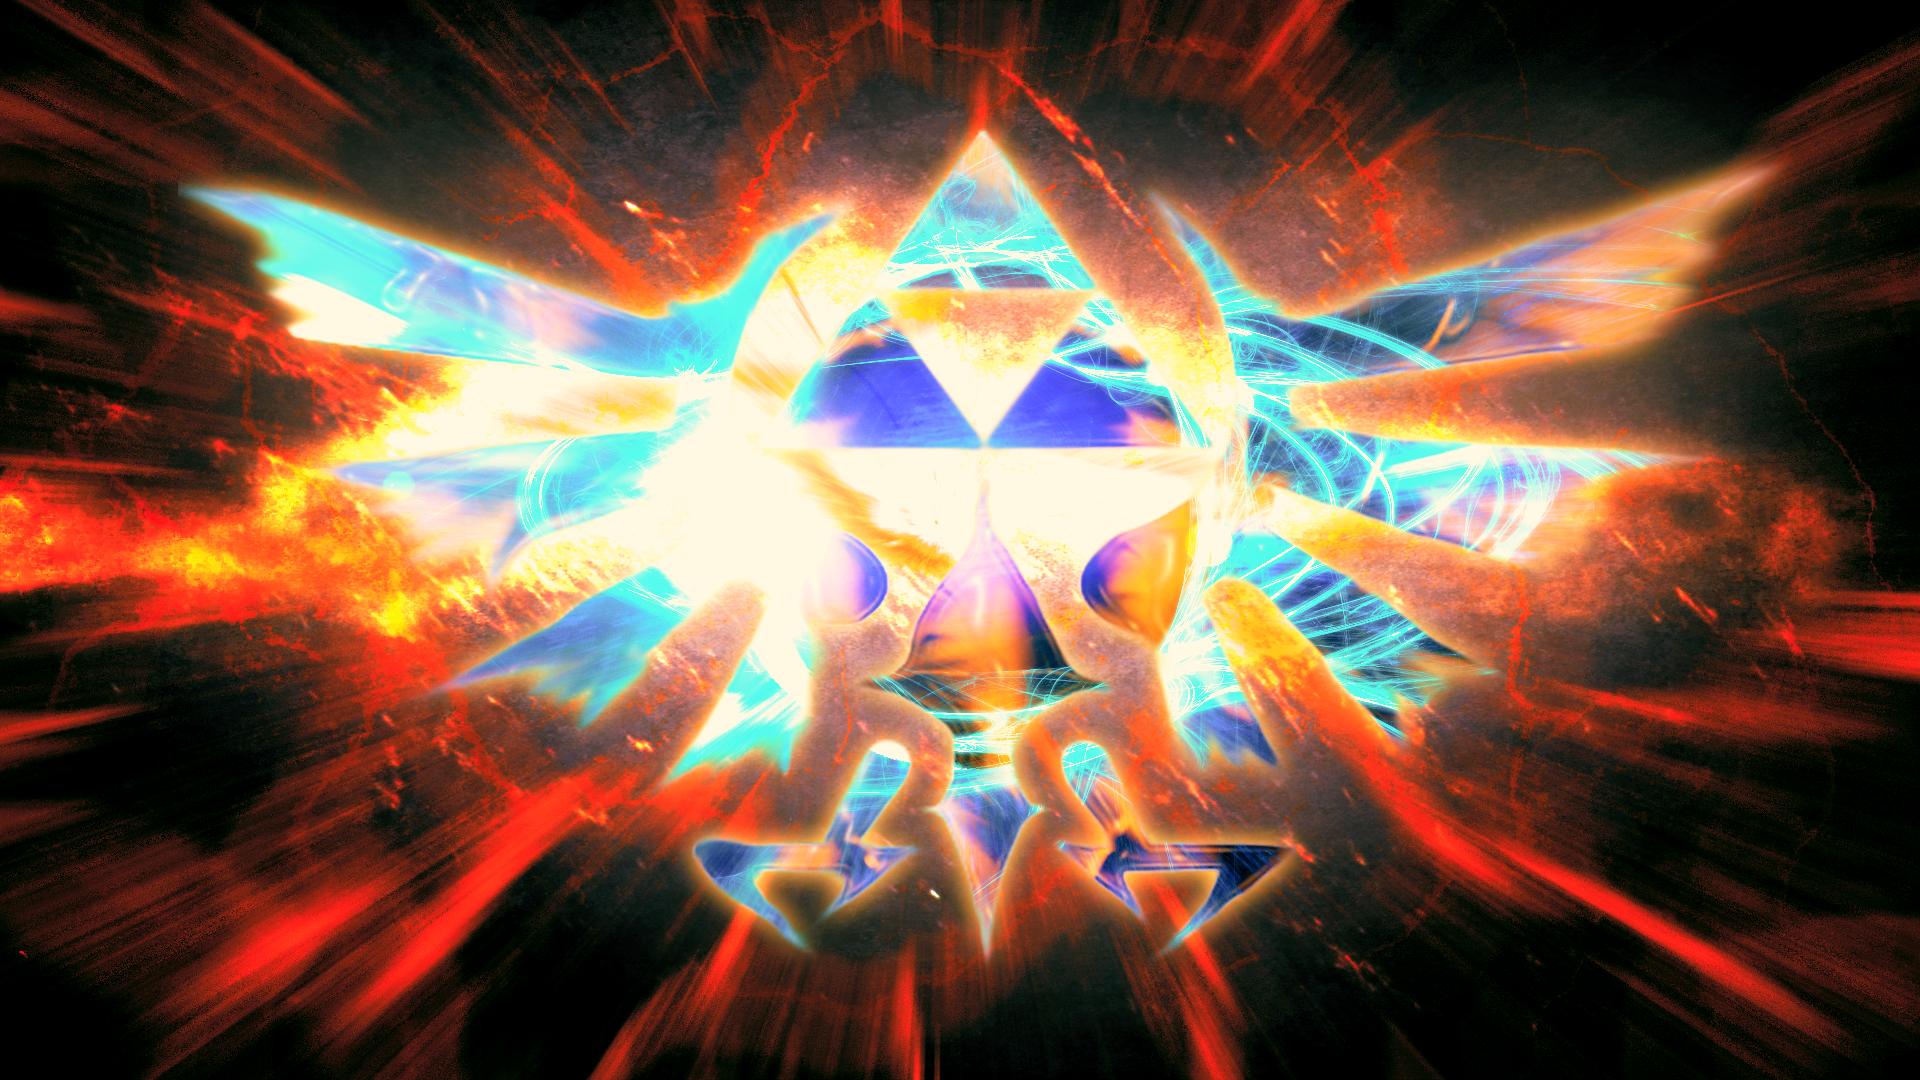 The Legend of Zelda (Wallpaper) by Hardii on DeviantArt